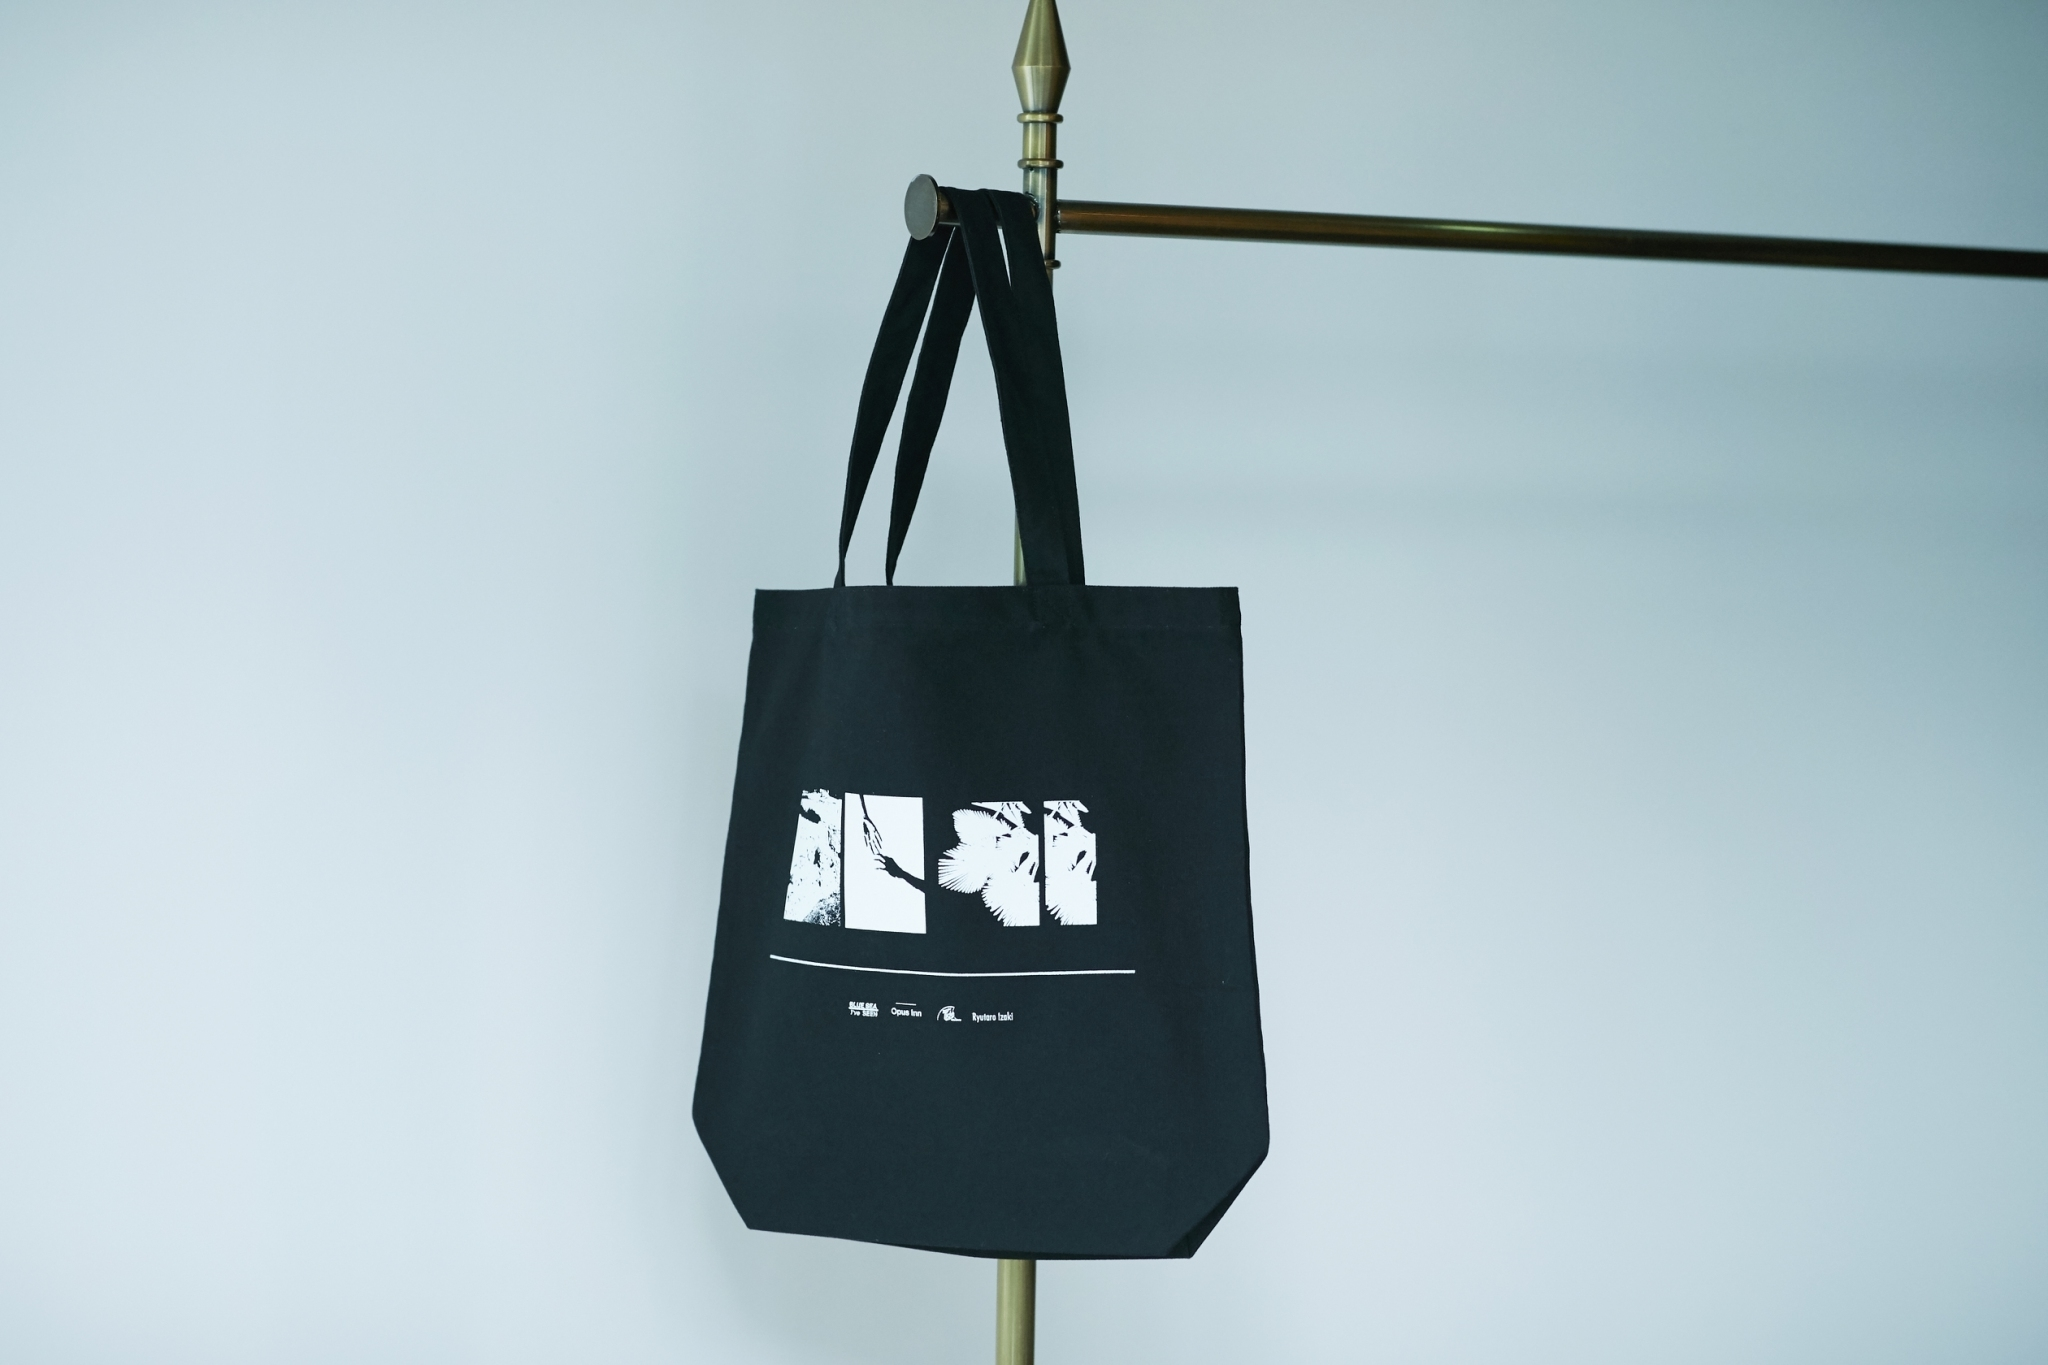 【Tote Bag】BLUE SEA I've SEEN Tote Bag